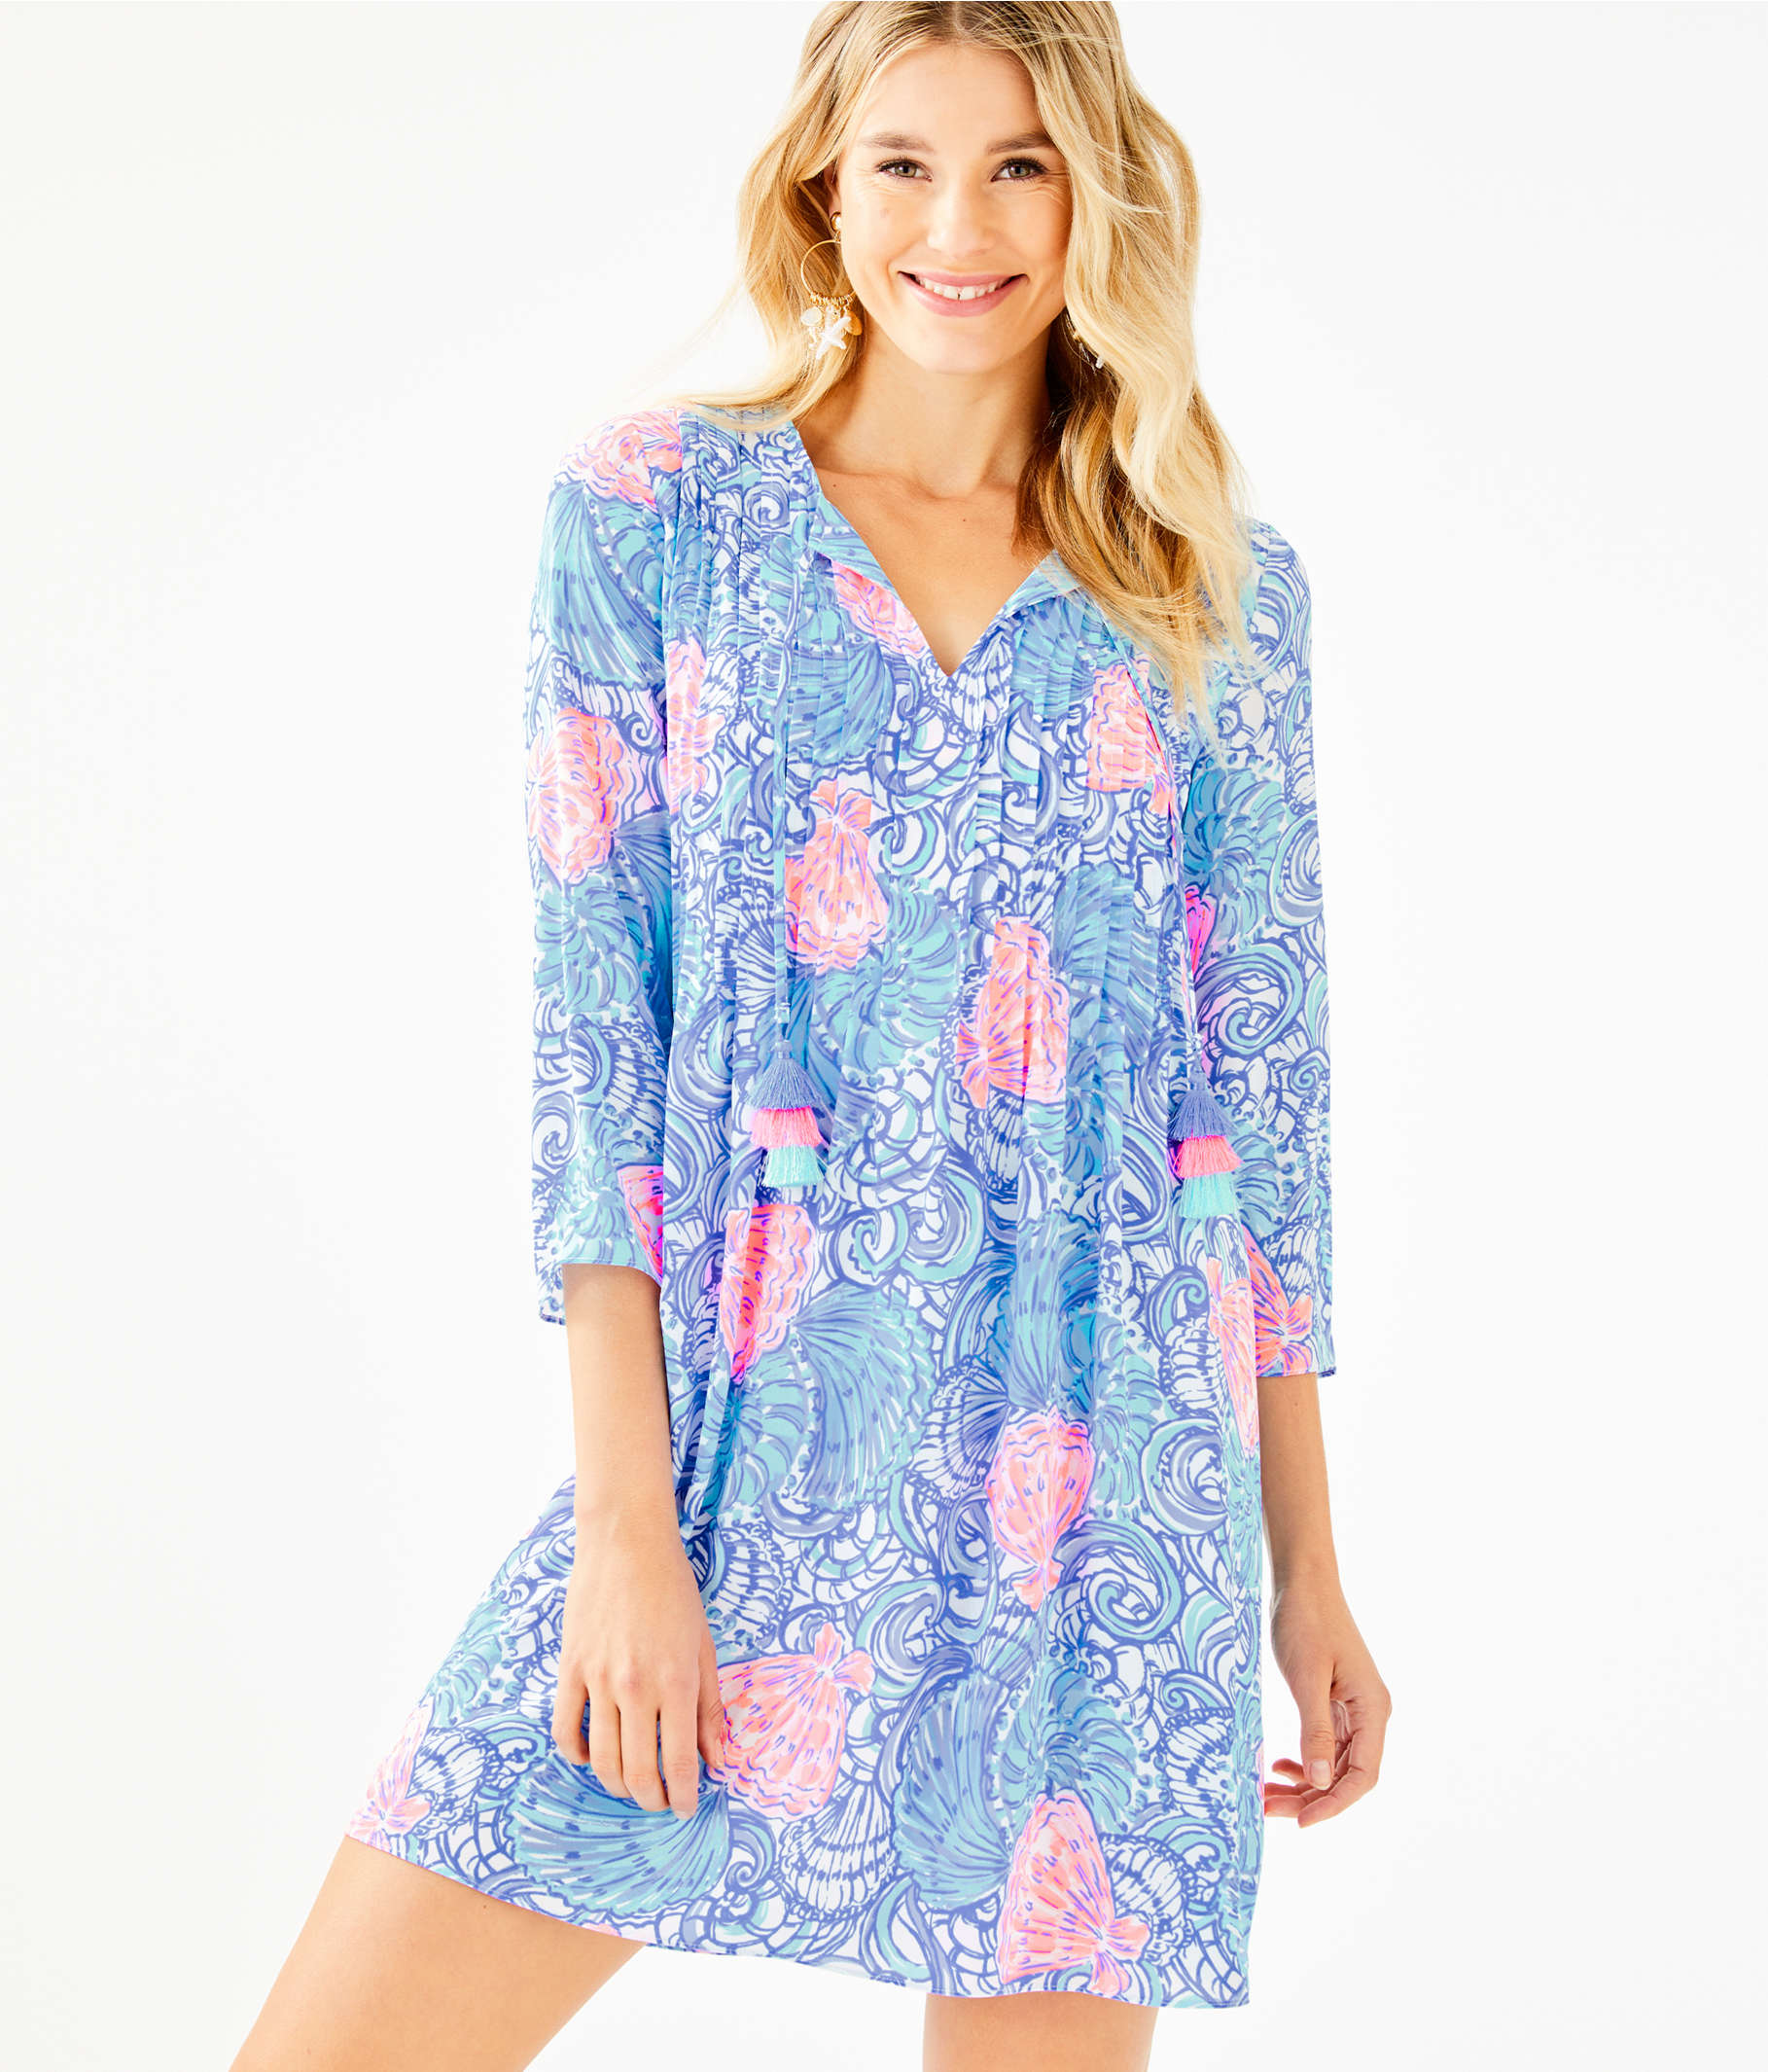 bc1c92c0364 ... Marilina Tunic Dress, Blue Haven Raising Shell, large ...